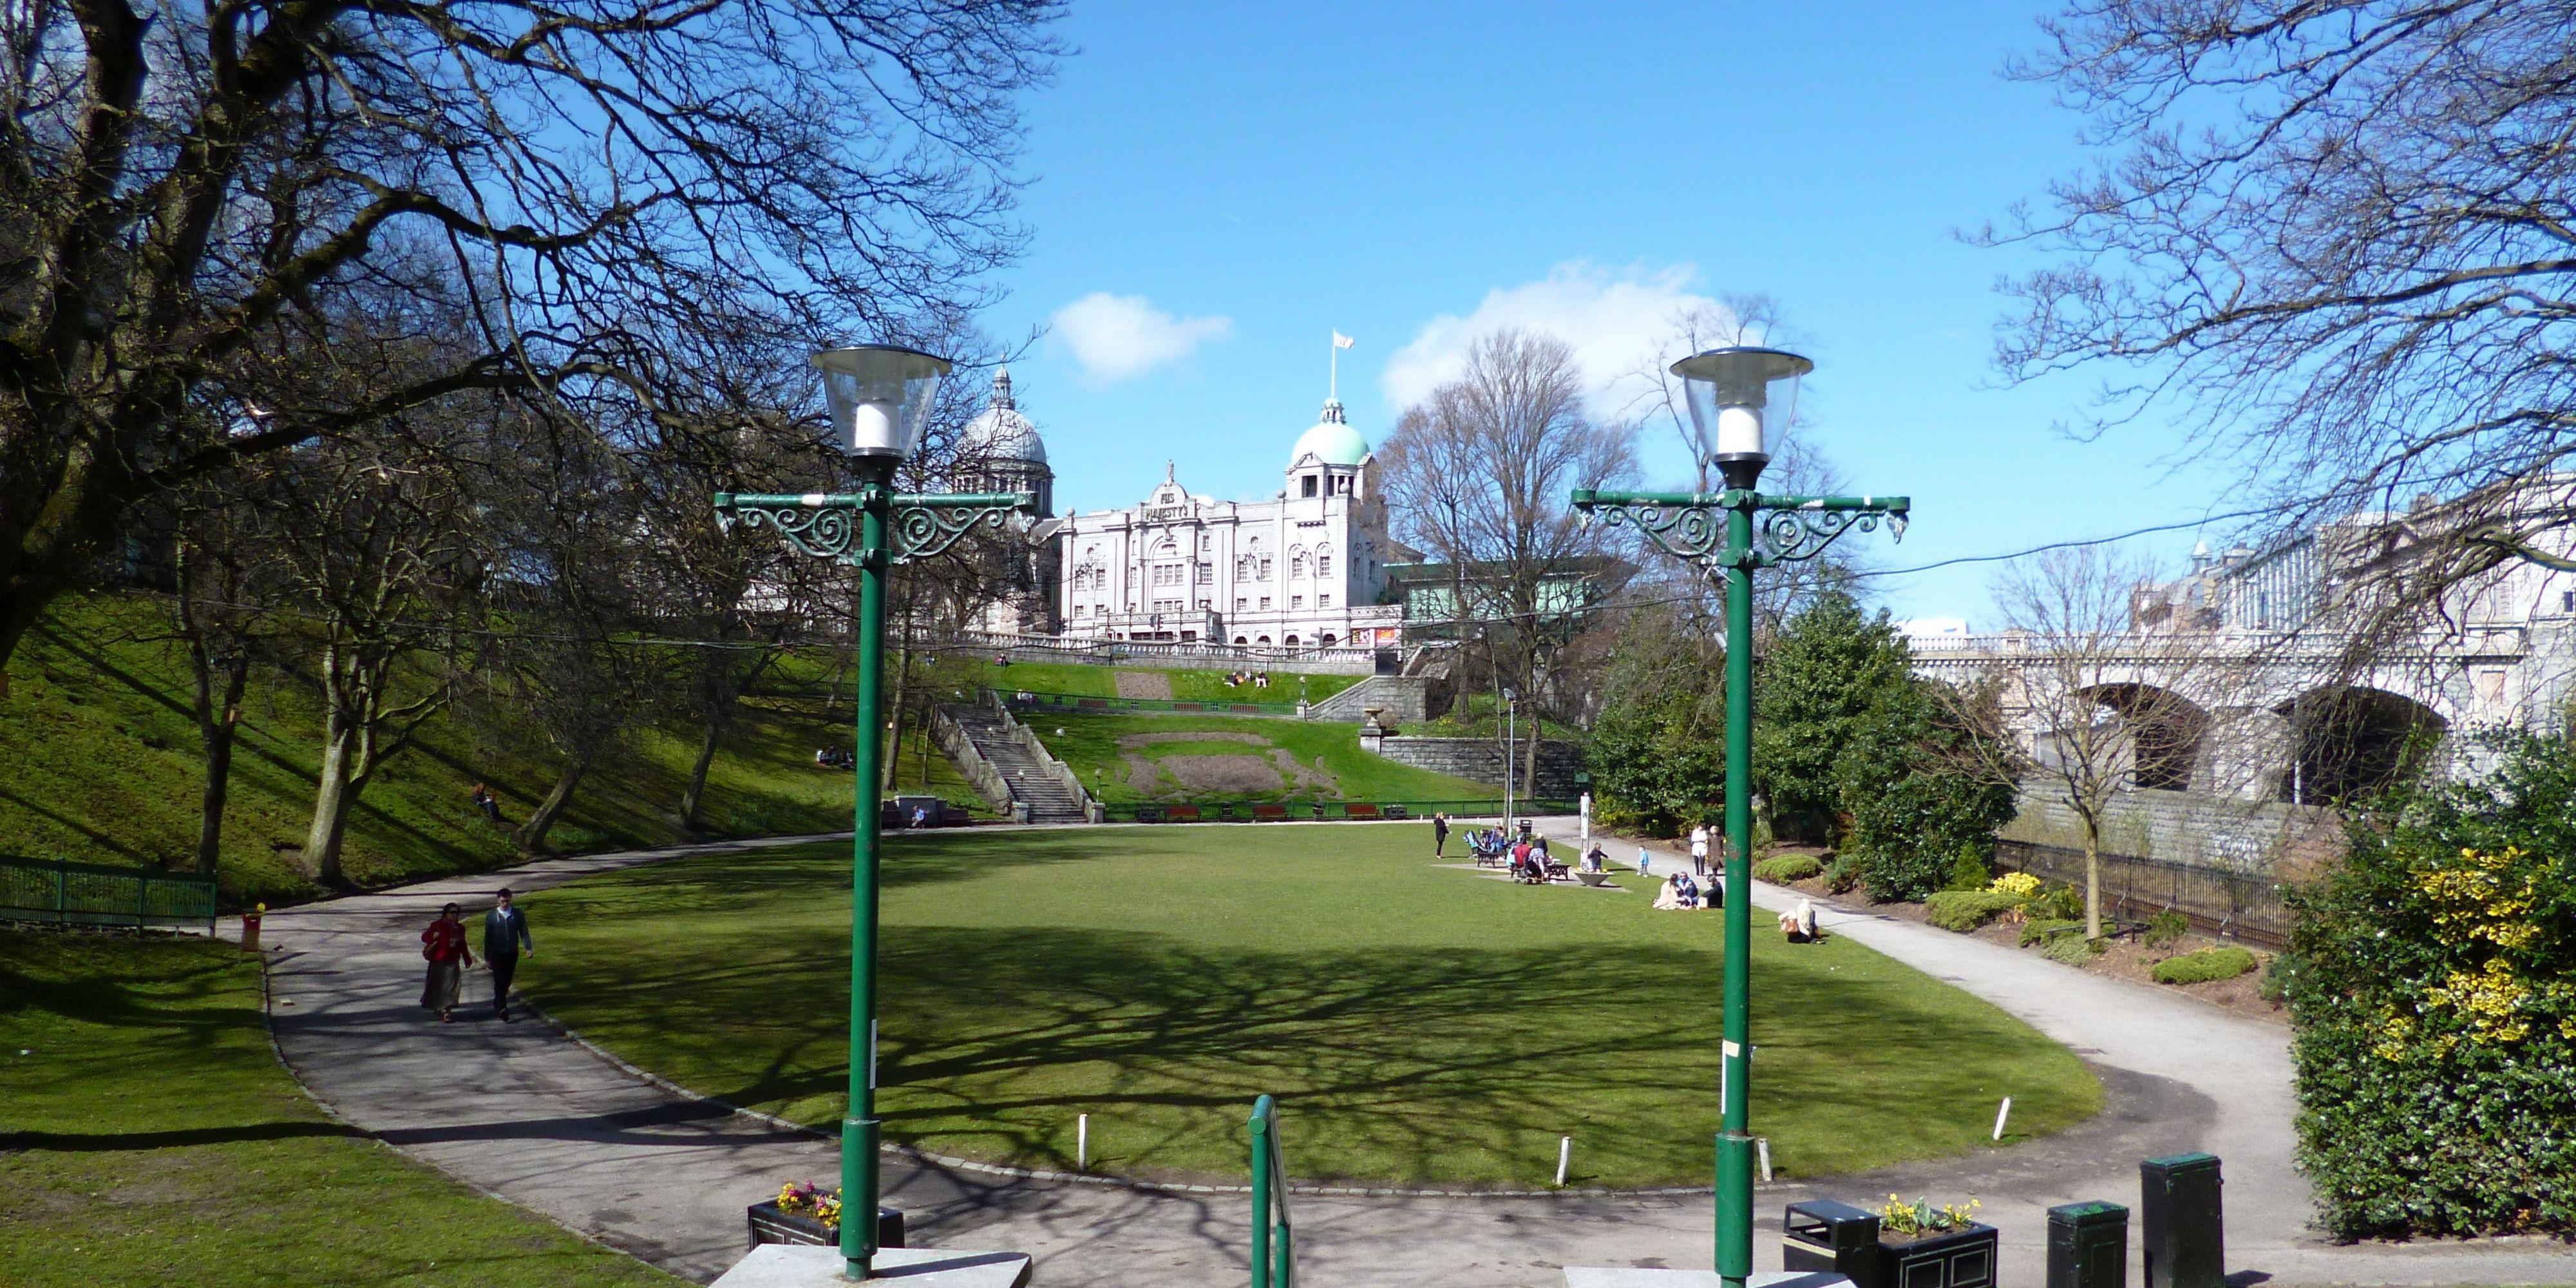 gratis dating sites Aberdeenshire